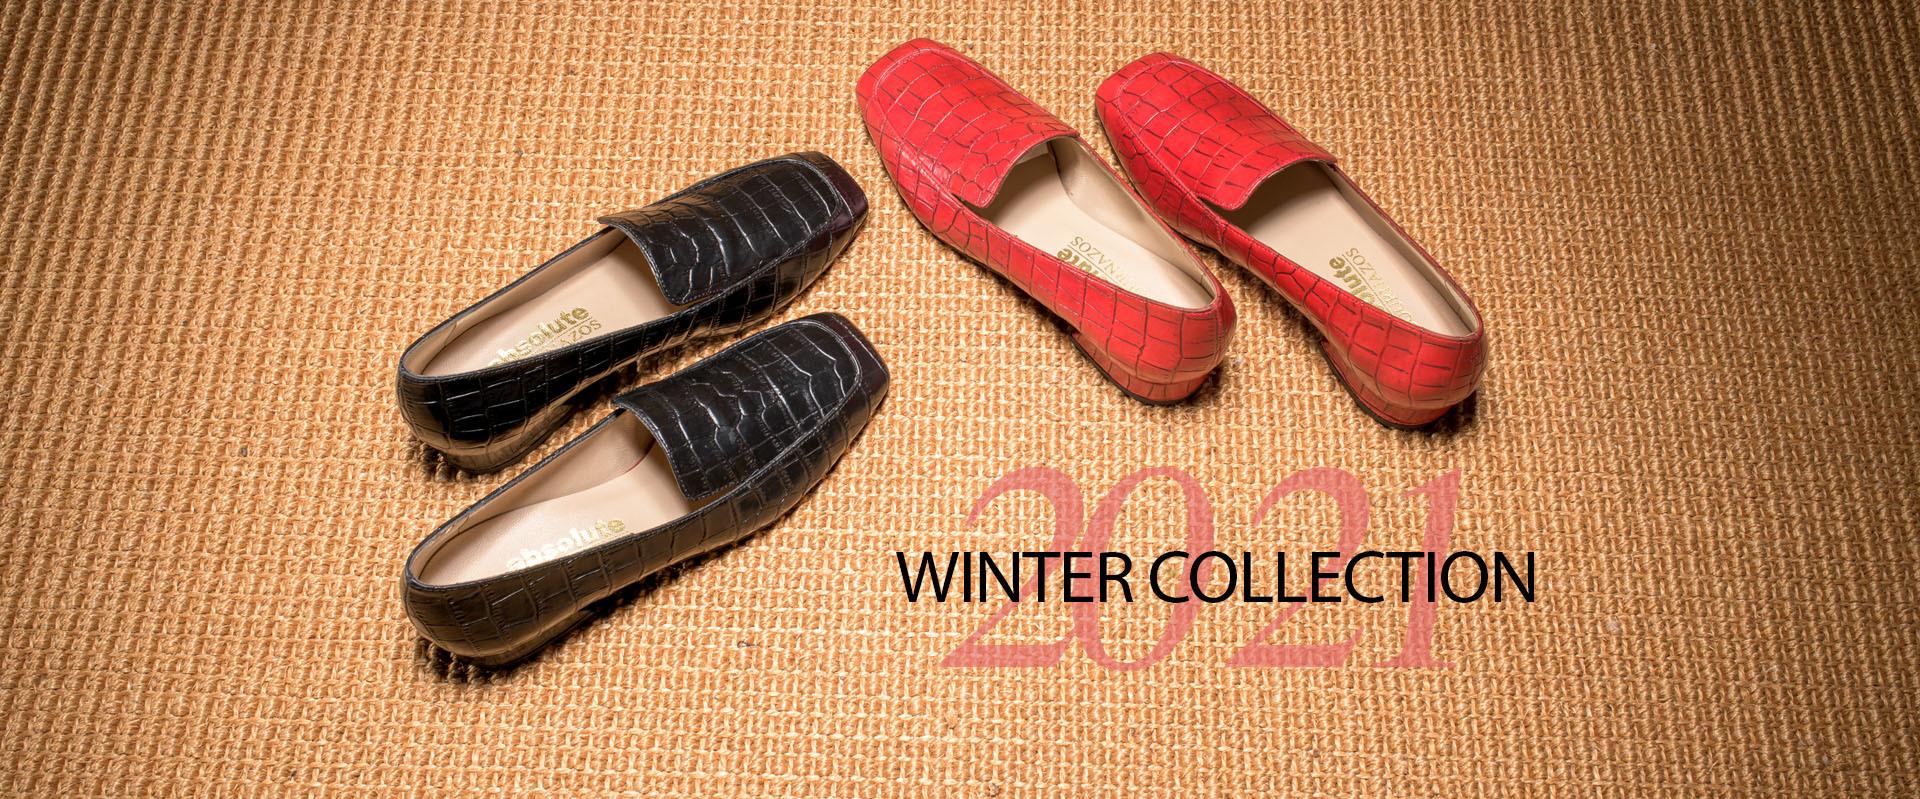 Winter 1920x799